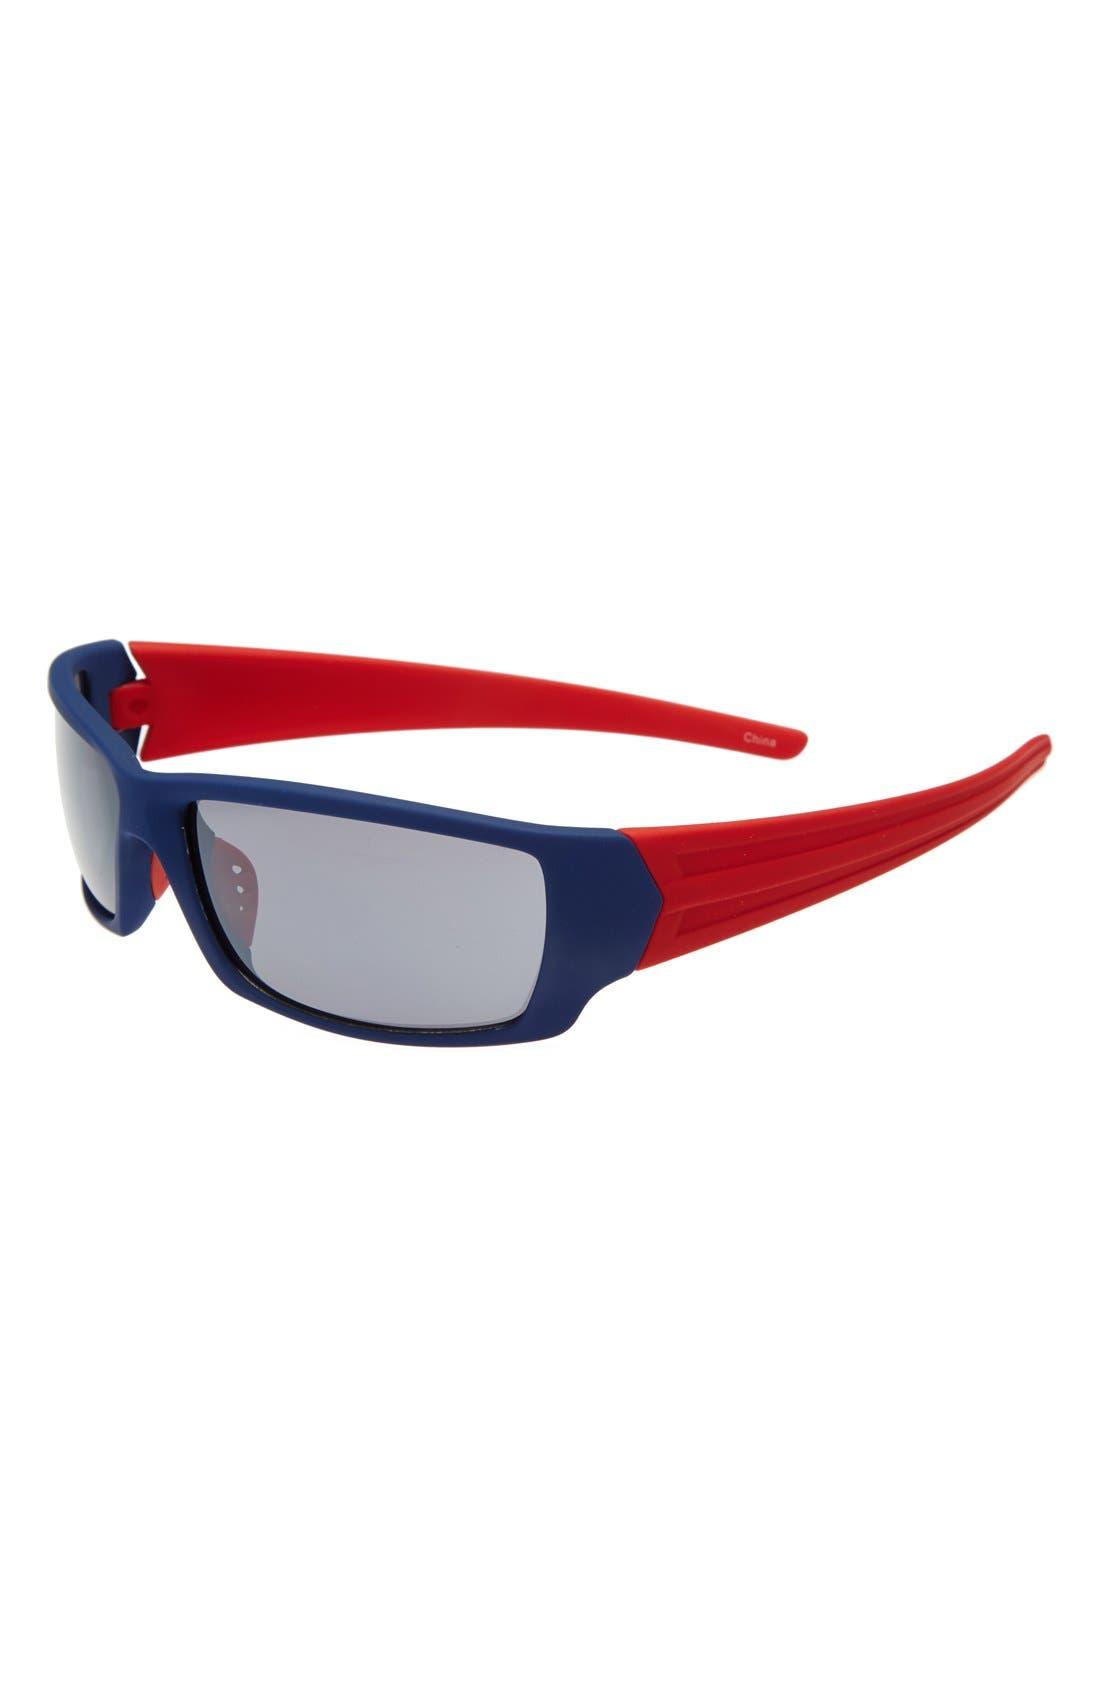 Main Image - Icon Eyewear 'Hugh' Two-Tone Rubberized Sunglasses (Boys)